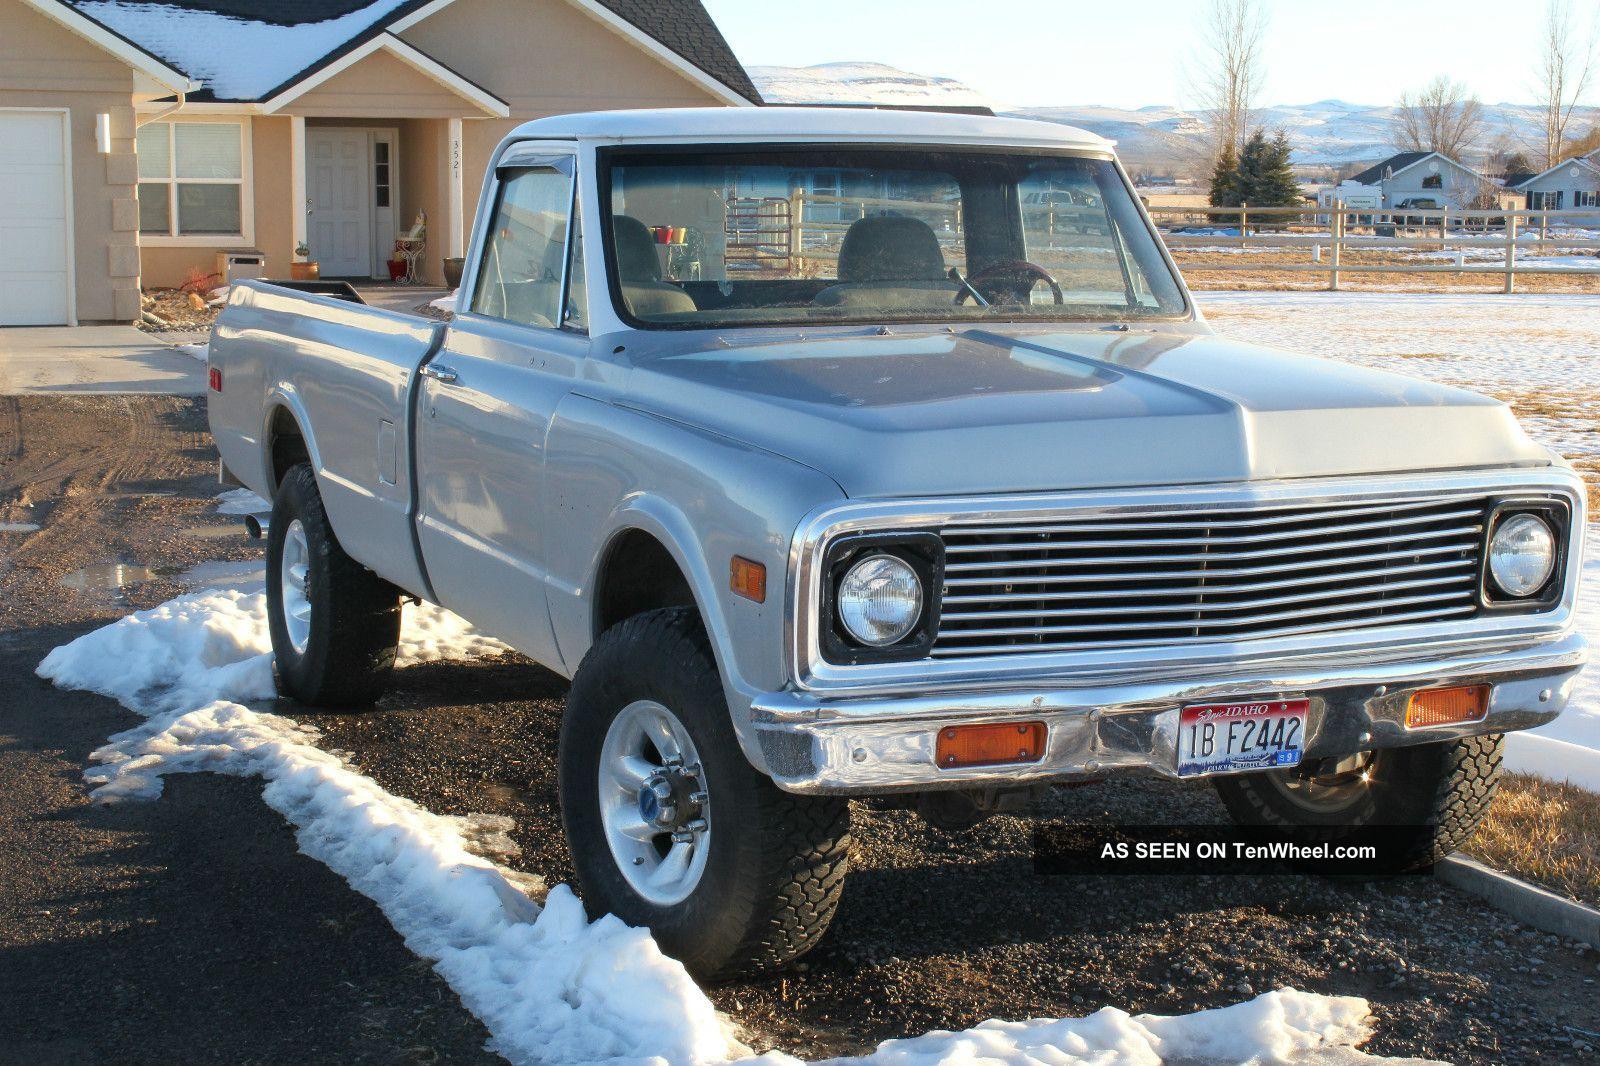 Craigslist Seattle Cars And Trucks By Owner >> 1972 Chevy Truck For Sale Craigslist   Joy Studio Design Gallery - Best Design